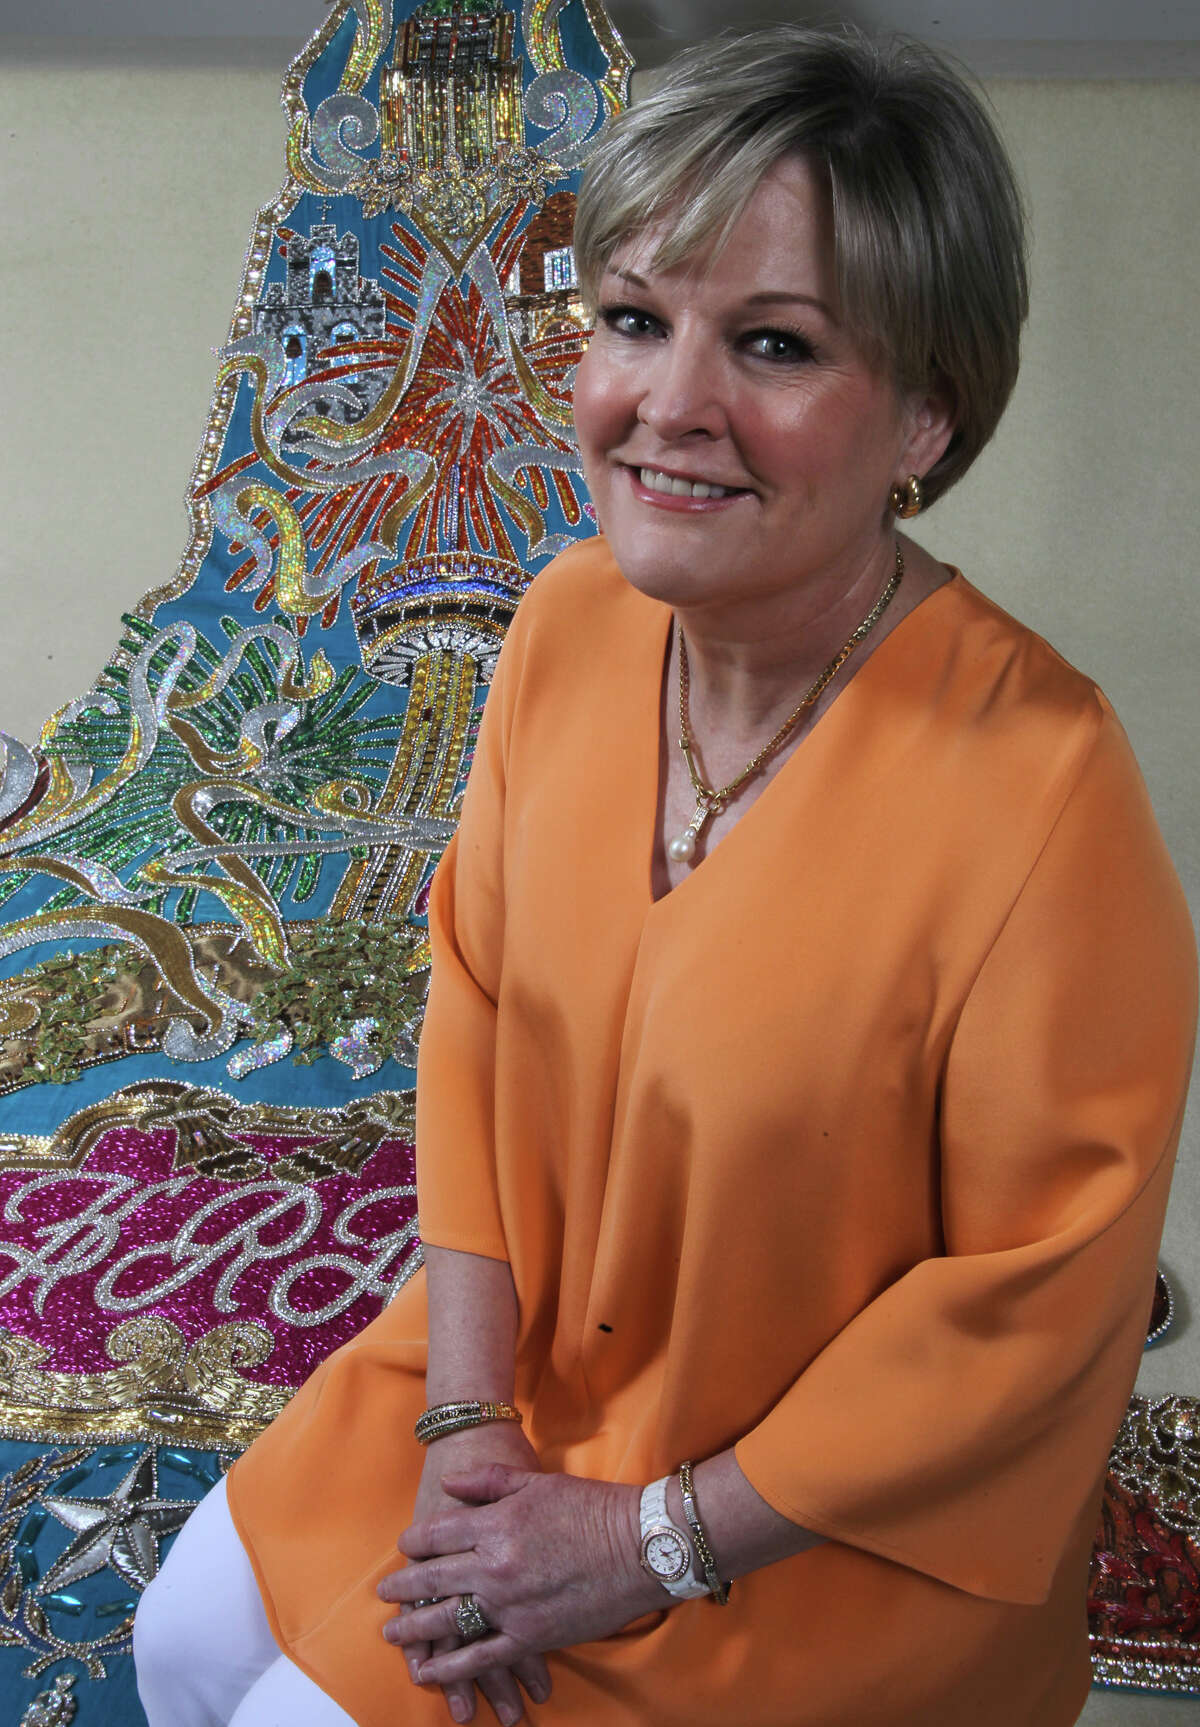 Susannah McAllister is this year's Order of the Alamo's Mistress of the Robes. (Friday April 6, 2012) John Davenport/San Antonio Express-News